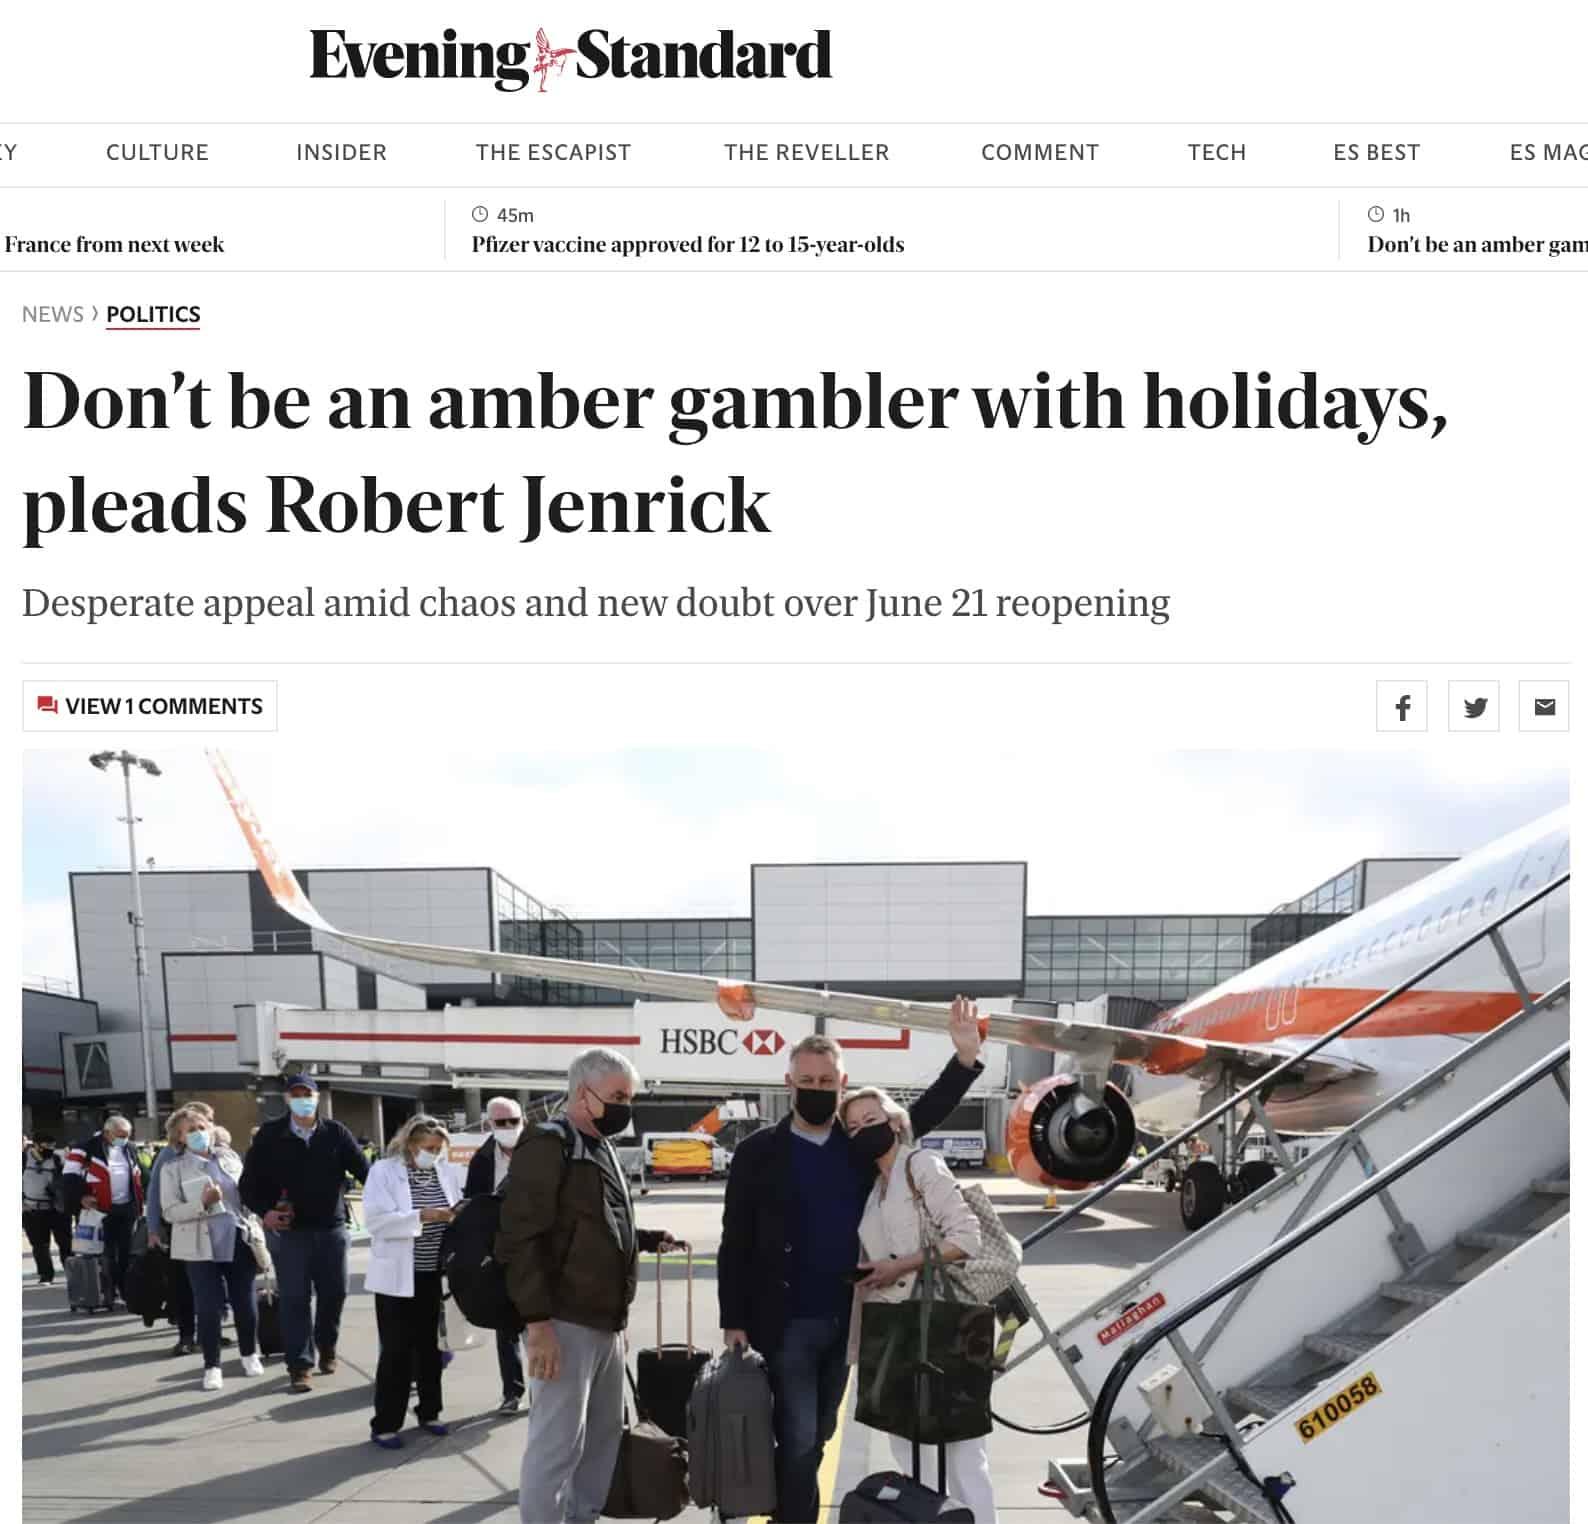 Evening Standard Huq Industries Coverage